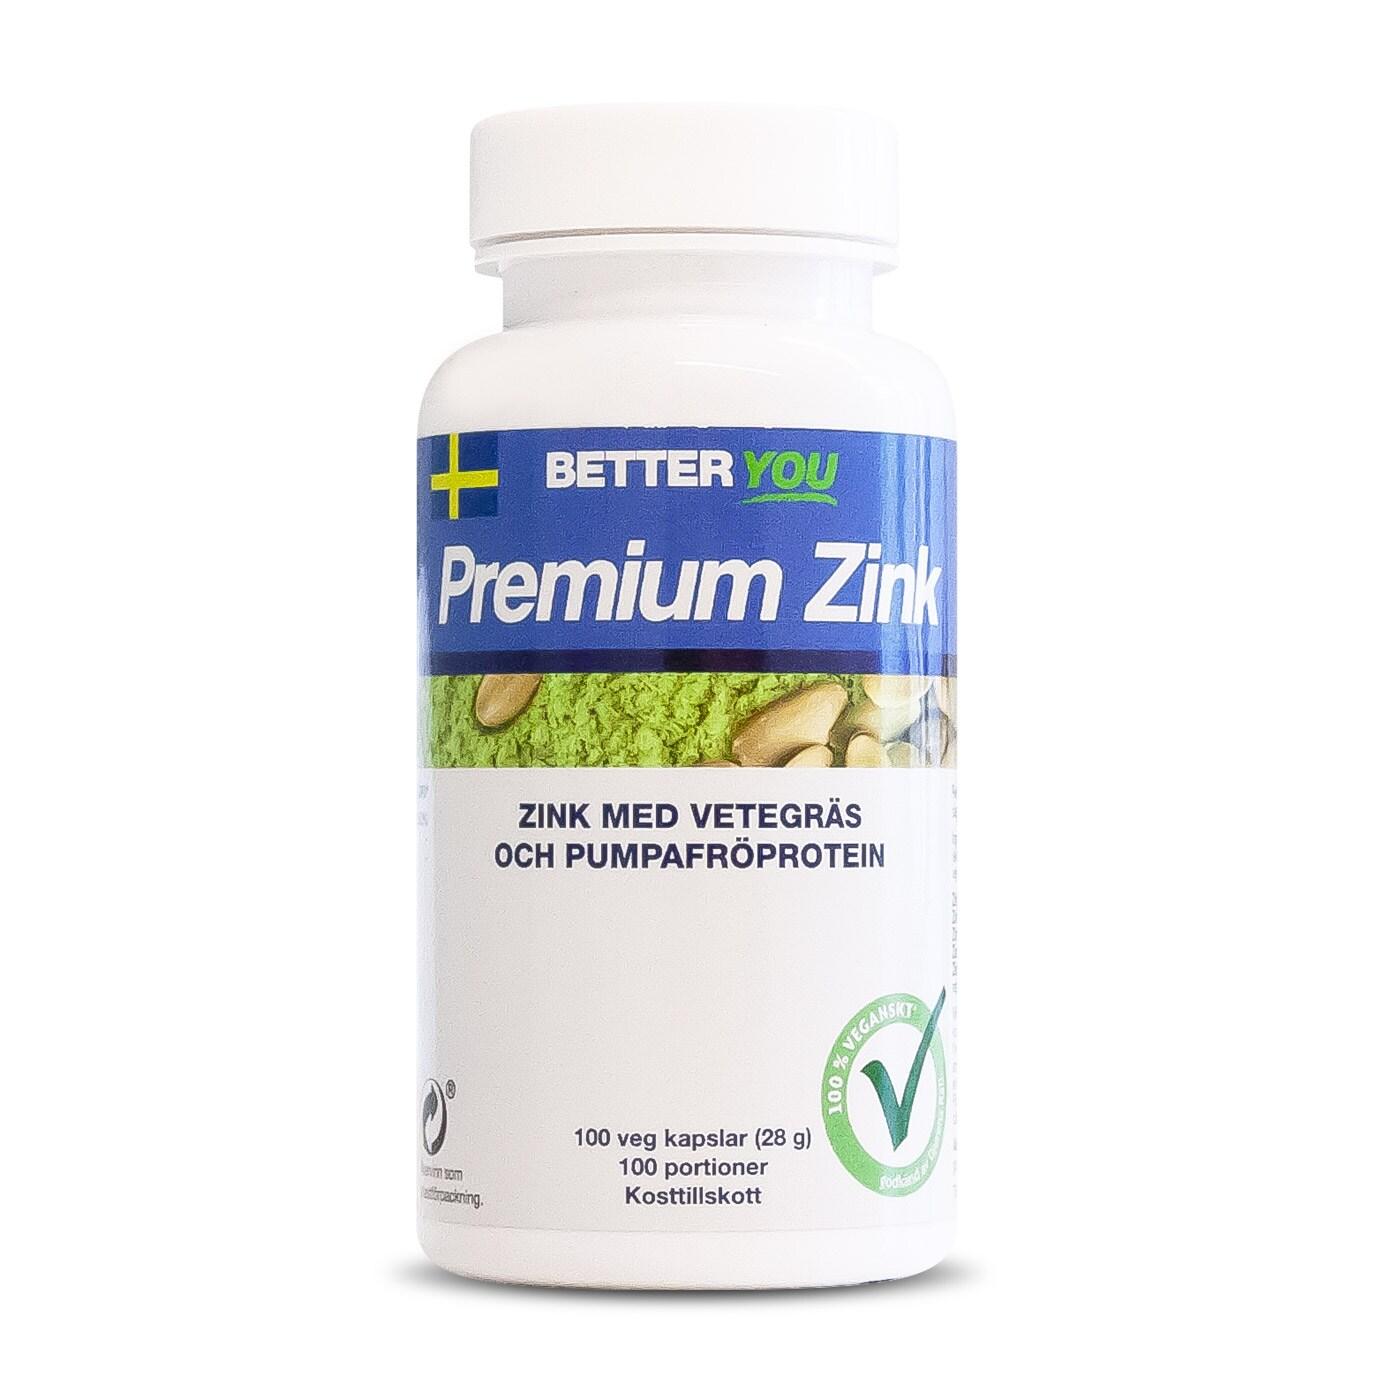 Premium Zink